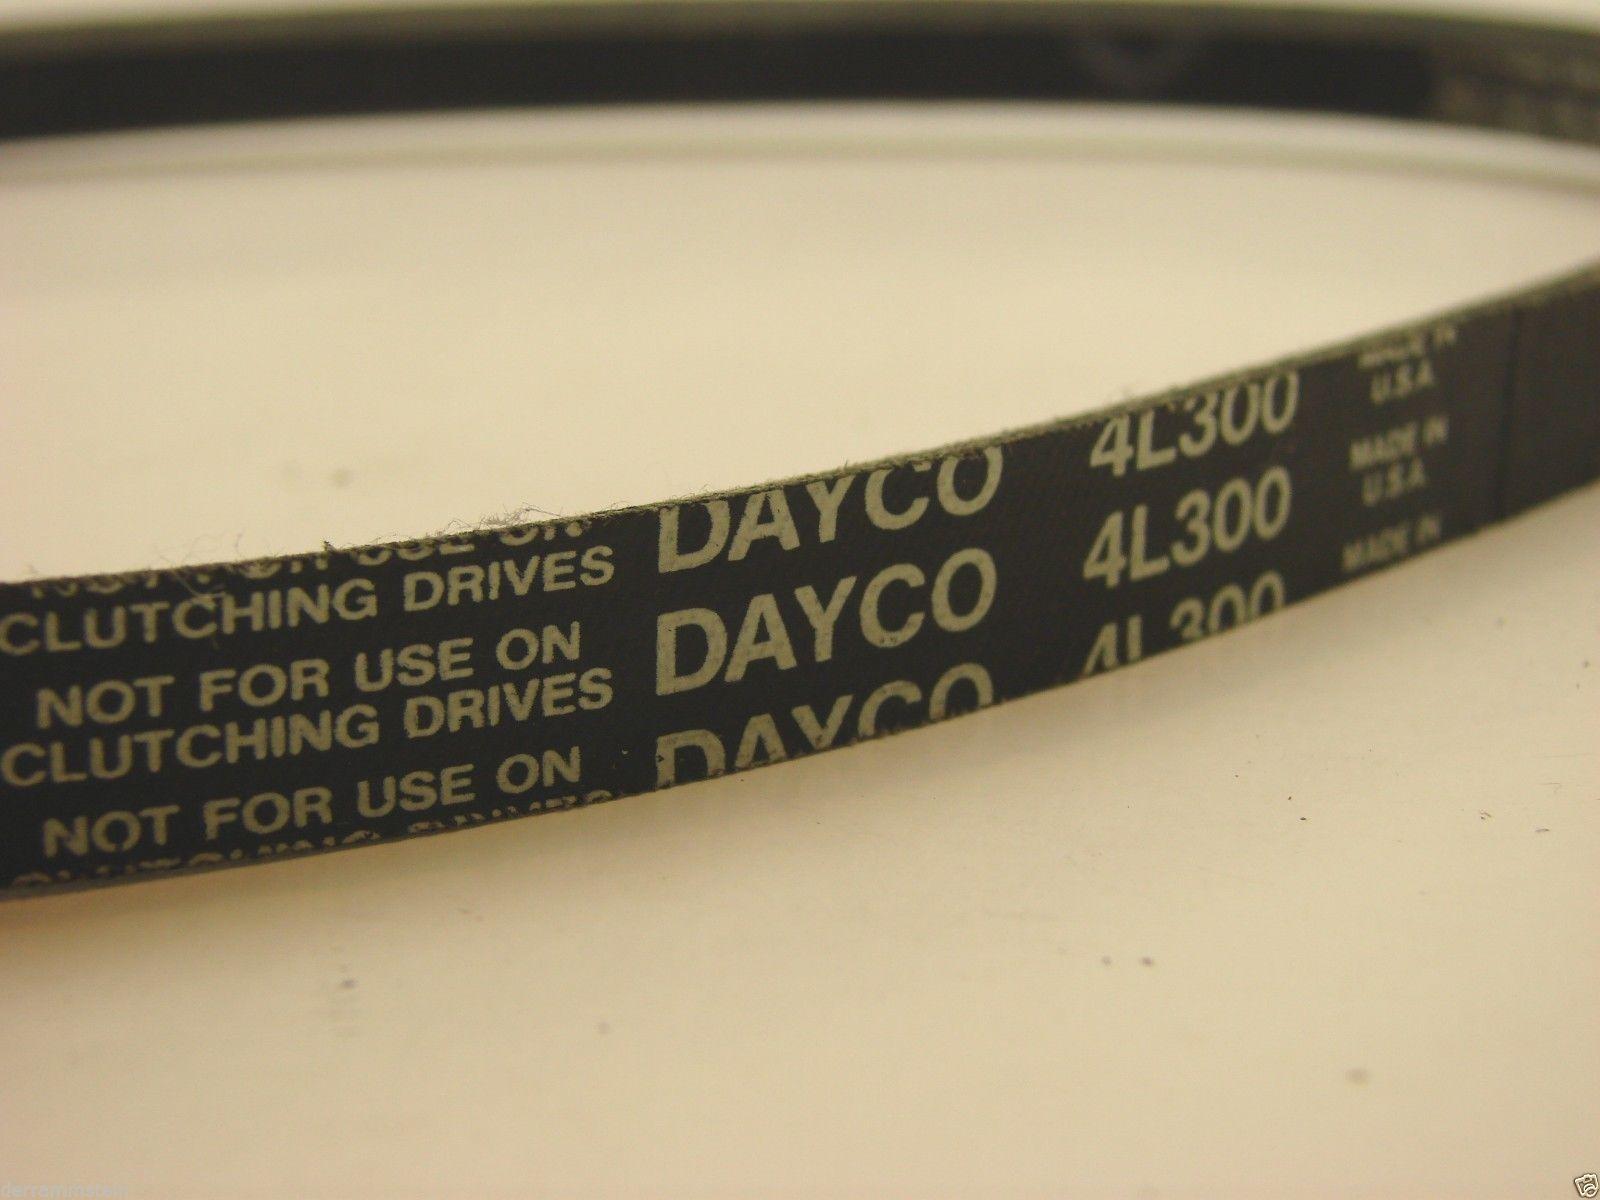 "DAYCO 4L300 FHP V-BELT 1/2"" X 29.85"" b75"